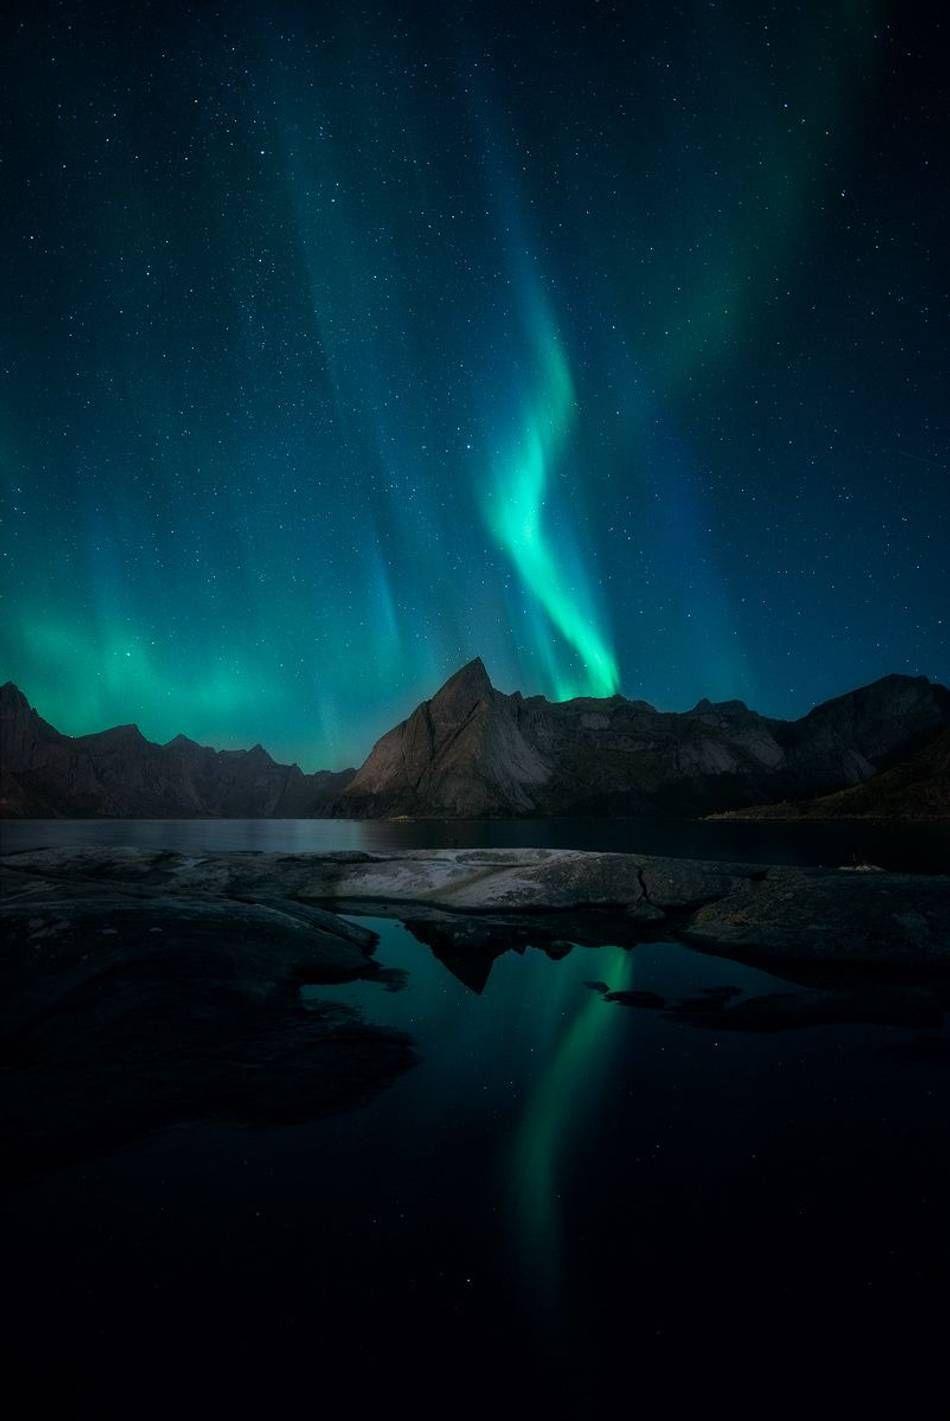 Arctic Night Arctic Landscape Northern Lights Photography Northern Lights